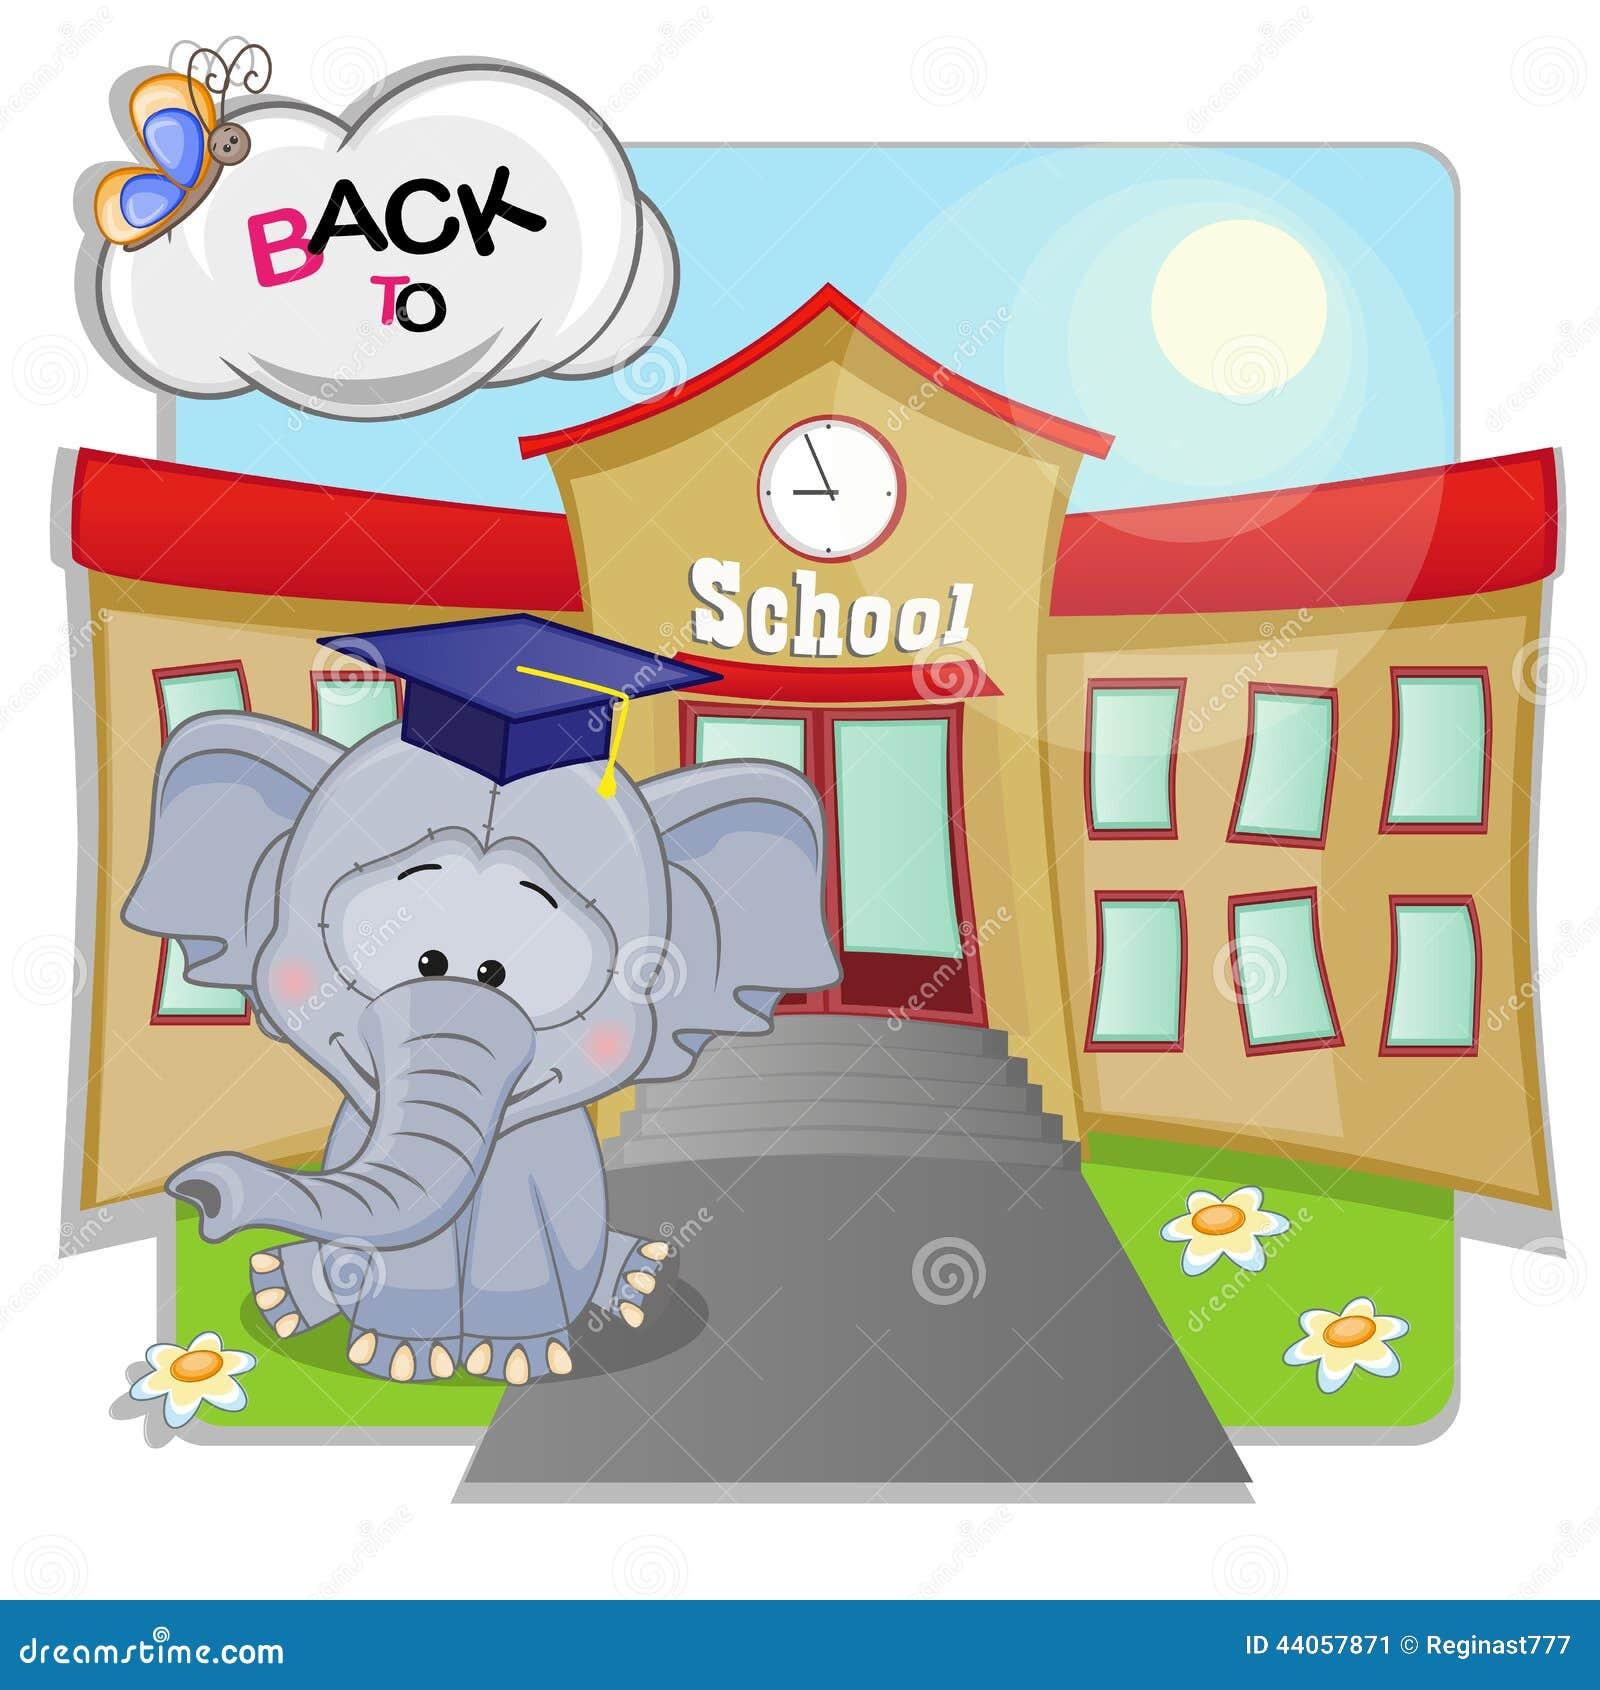 Elephant and school